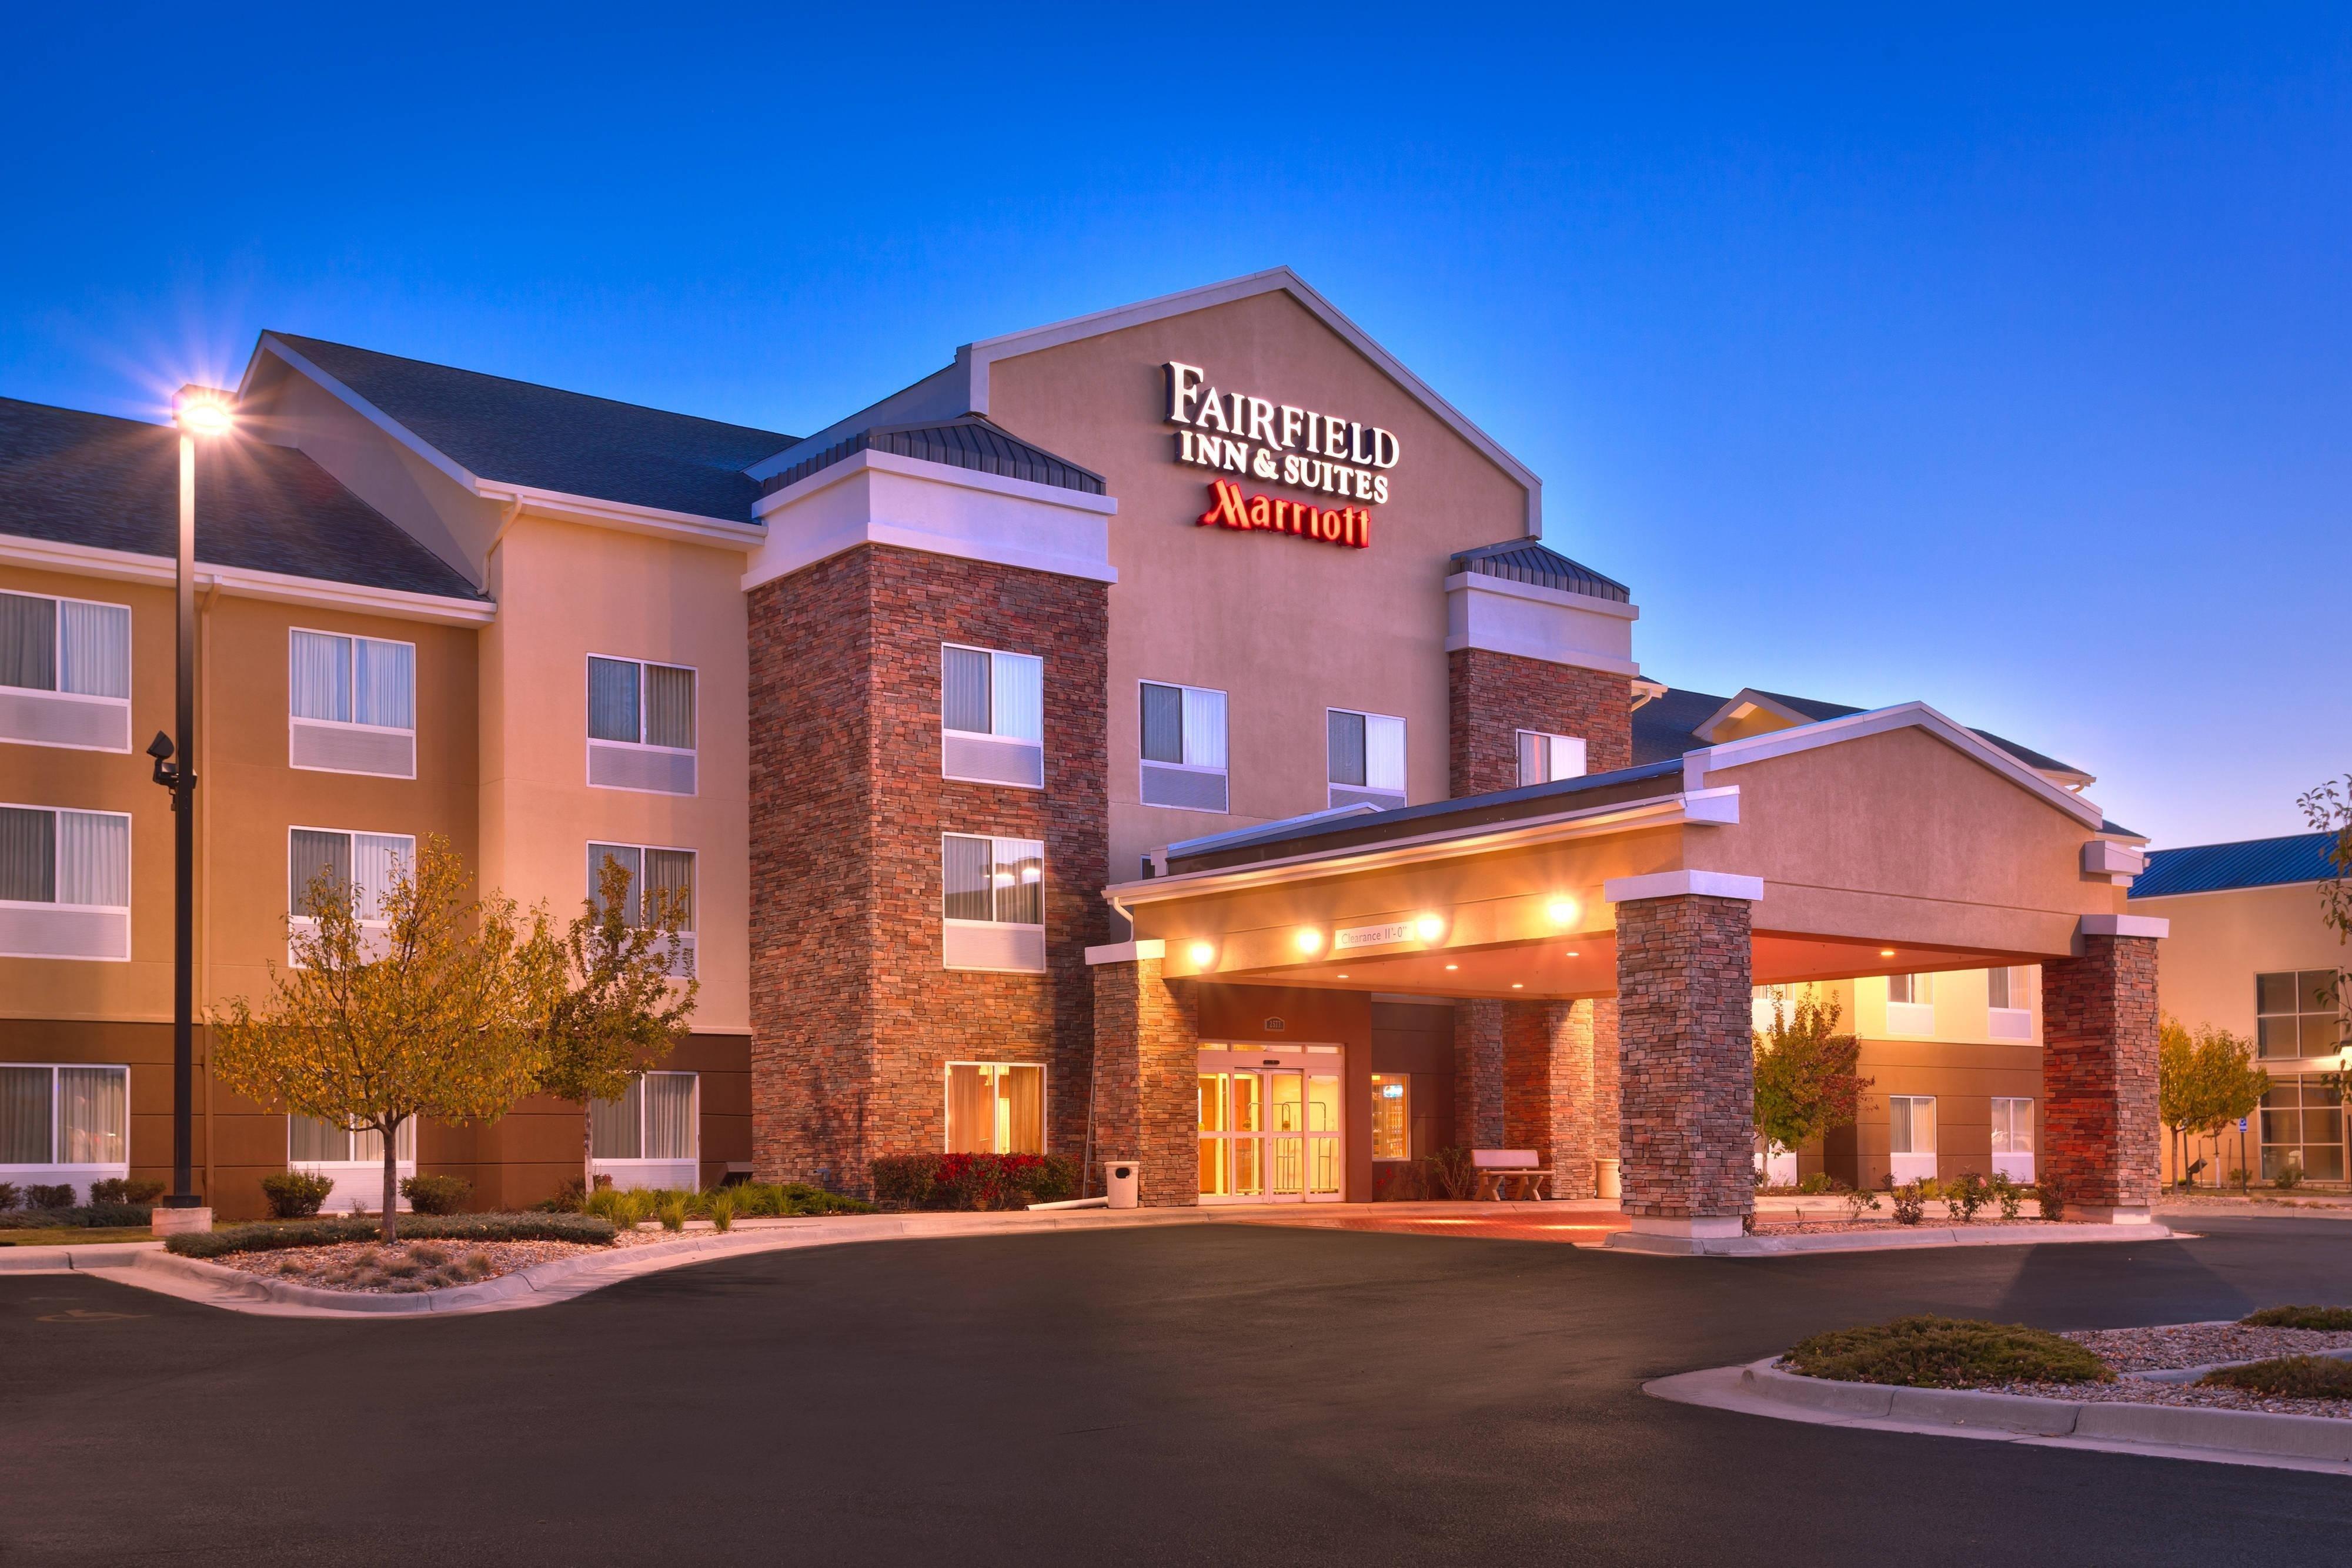 Fairfield Inn & Suites Gillette